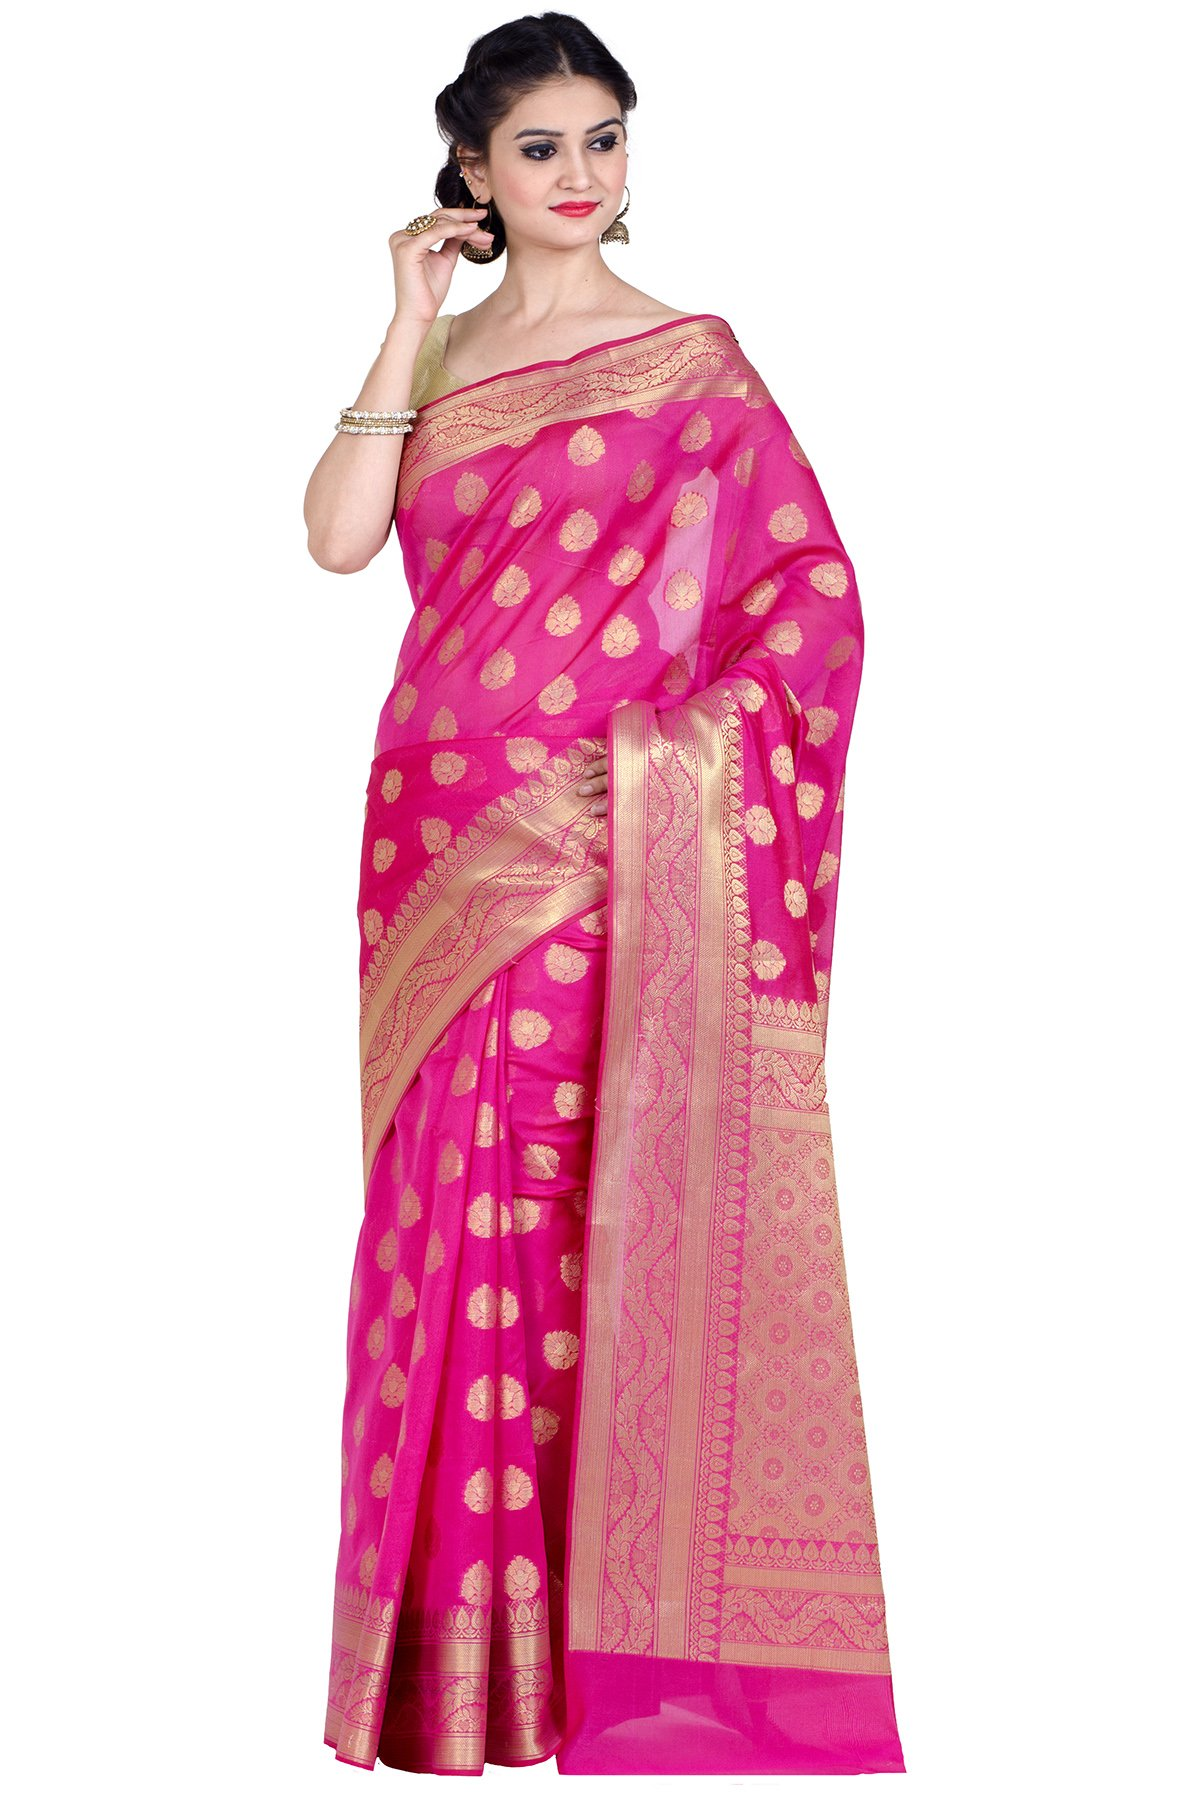 Chandrakala Women's Cotton Banarasi Saree Free Size Pink